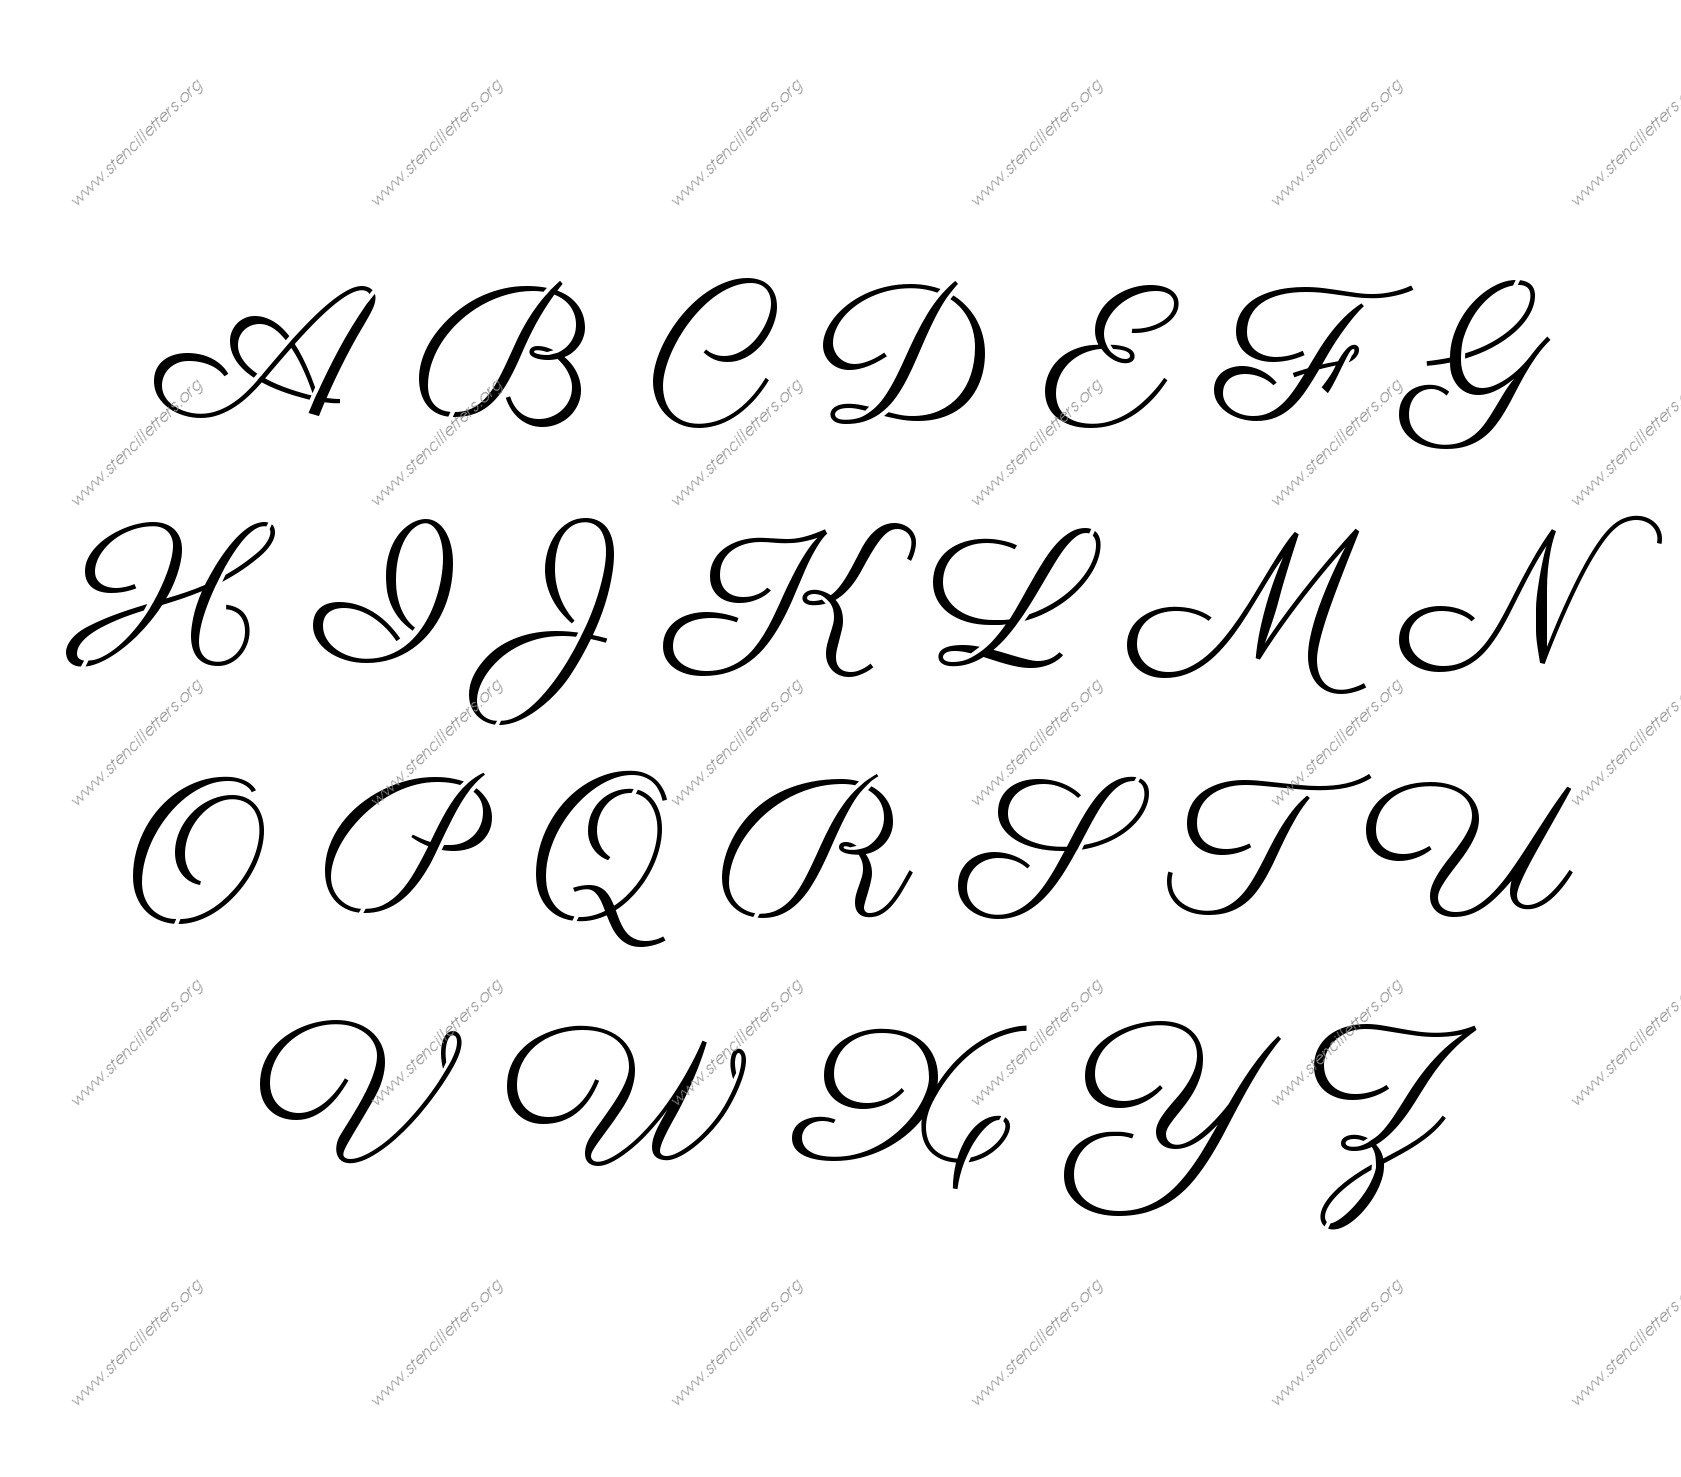 Free Printable Alphabet Stencil Letters Template | Art & Crafts - Free Printable Alphabet Stencils